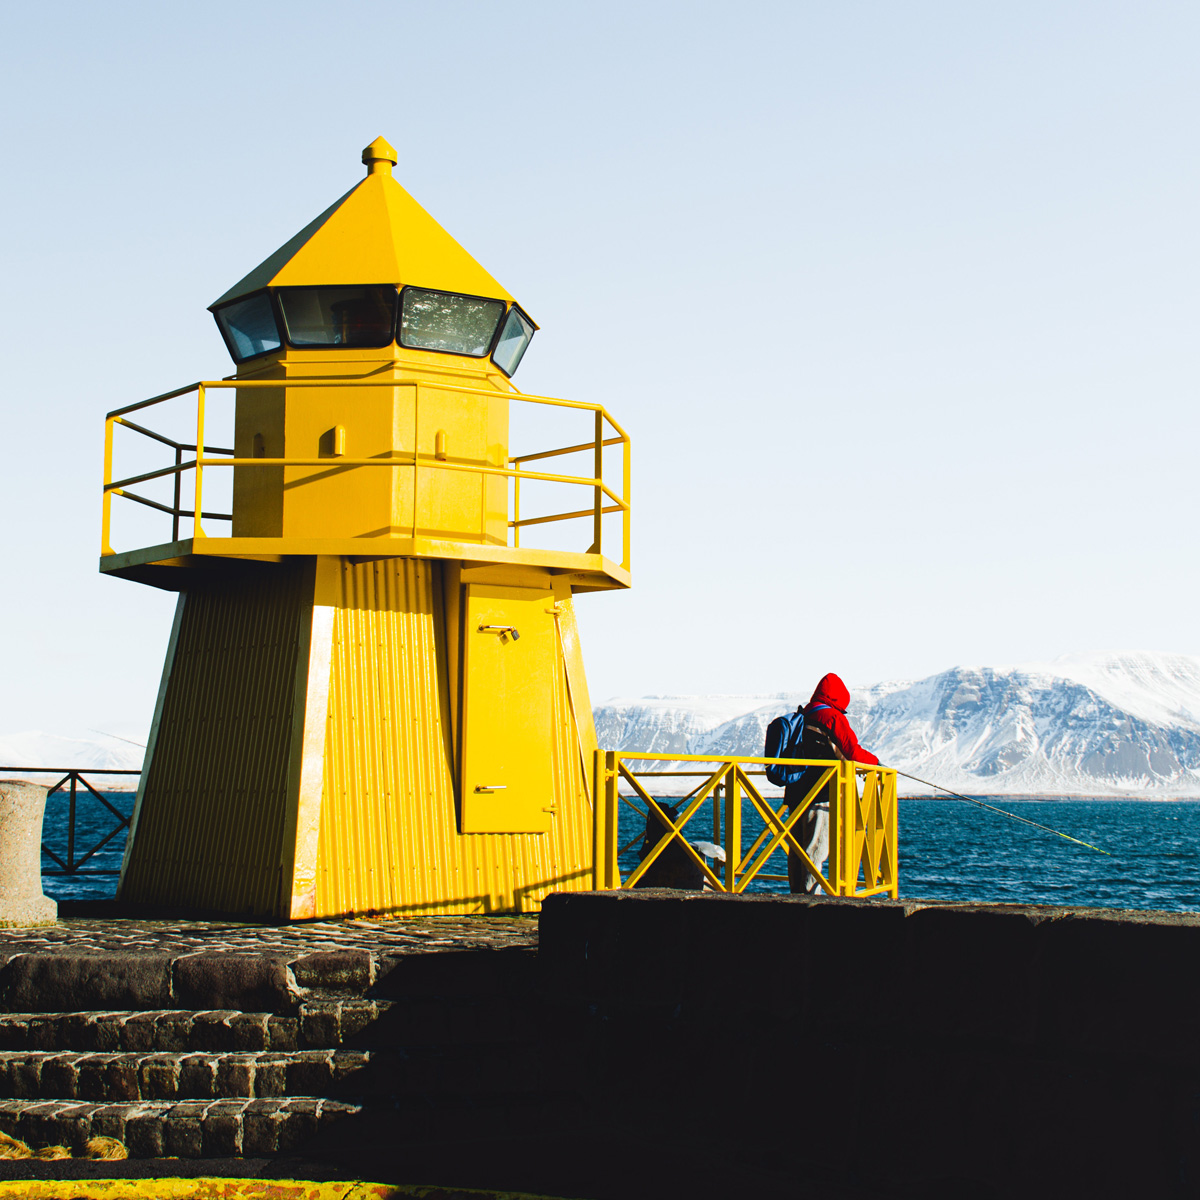 Island © Vadim Velichko | unsplash